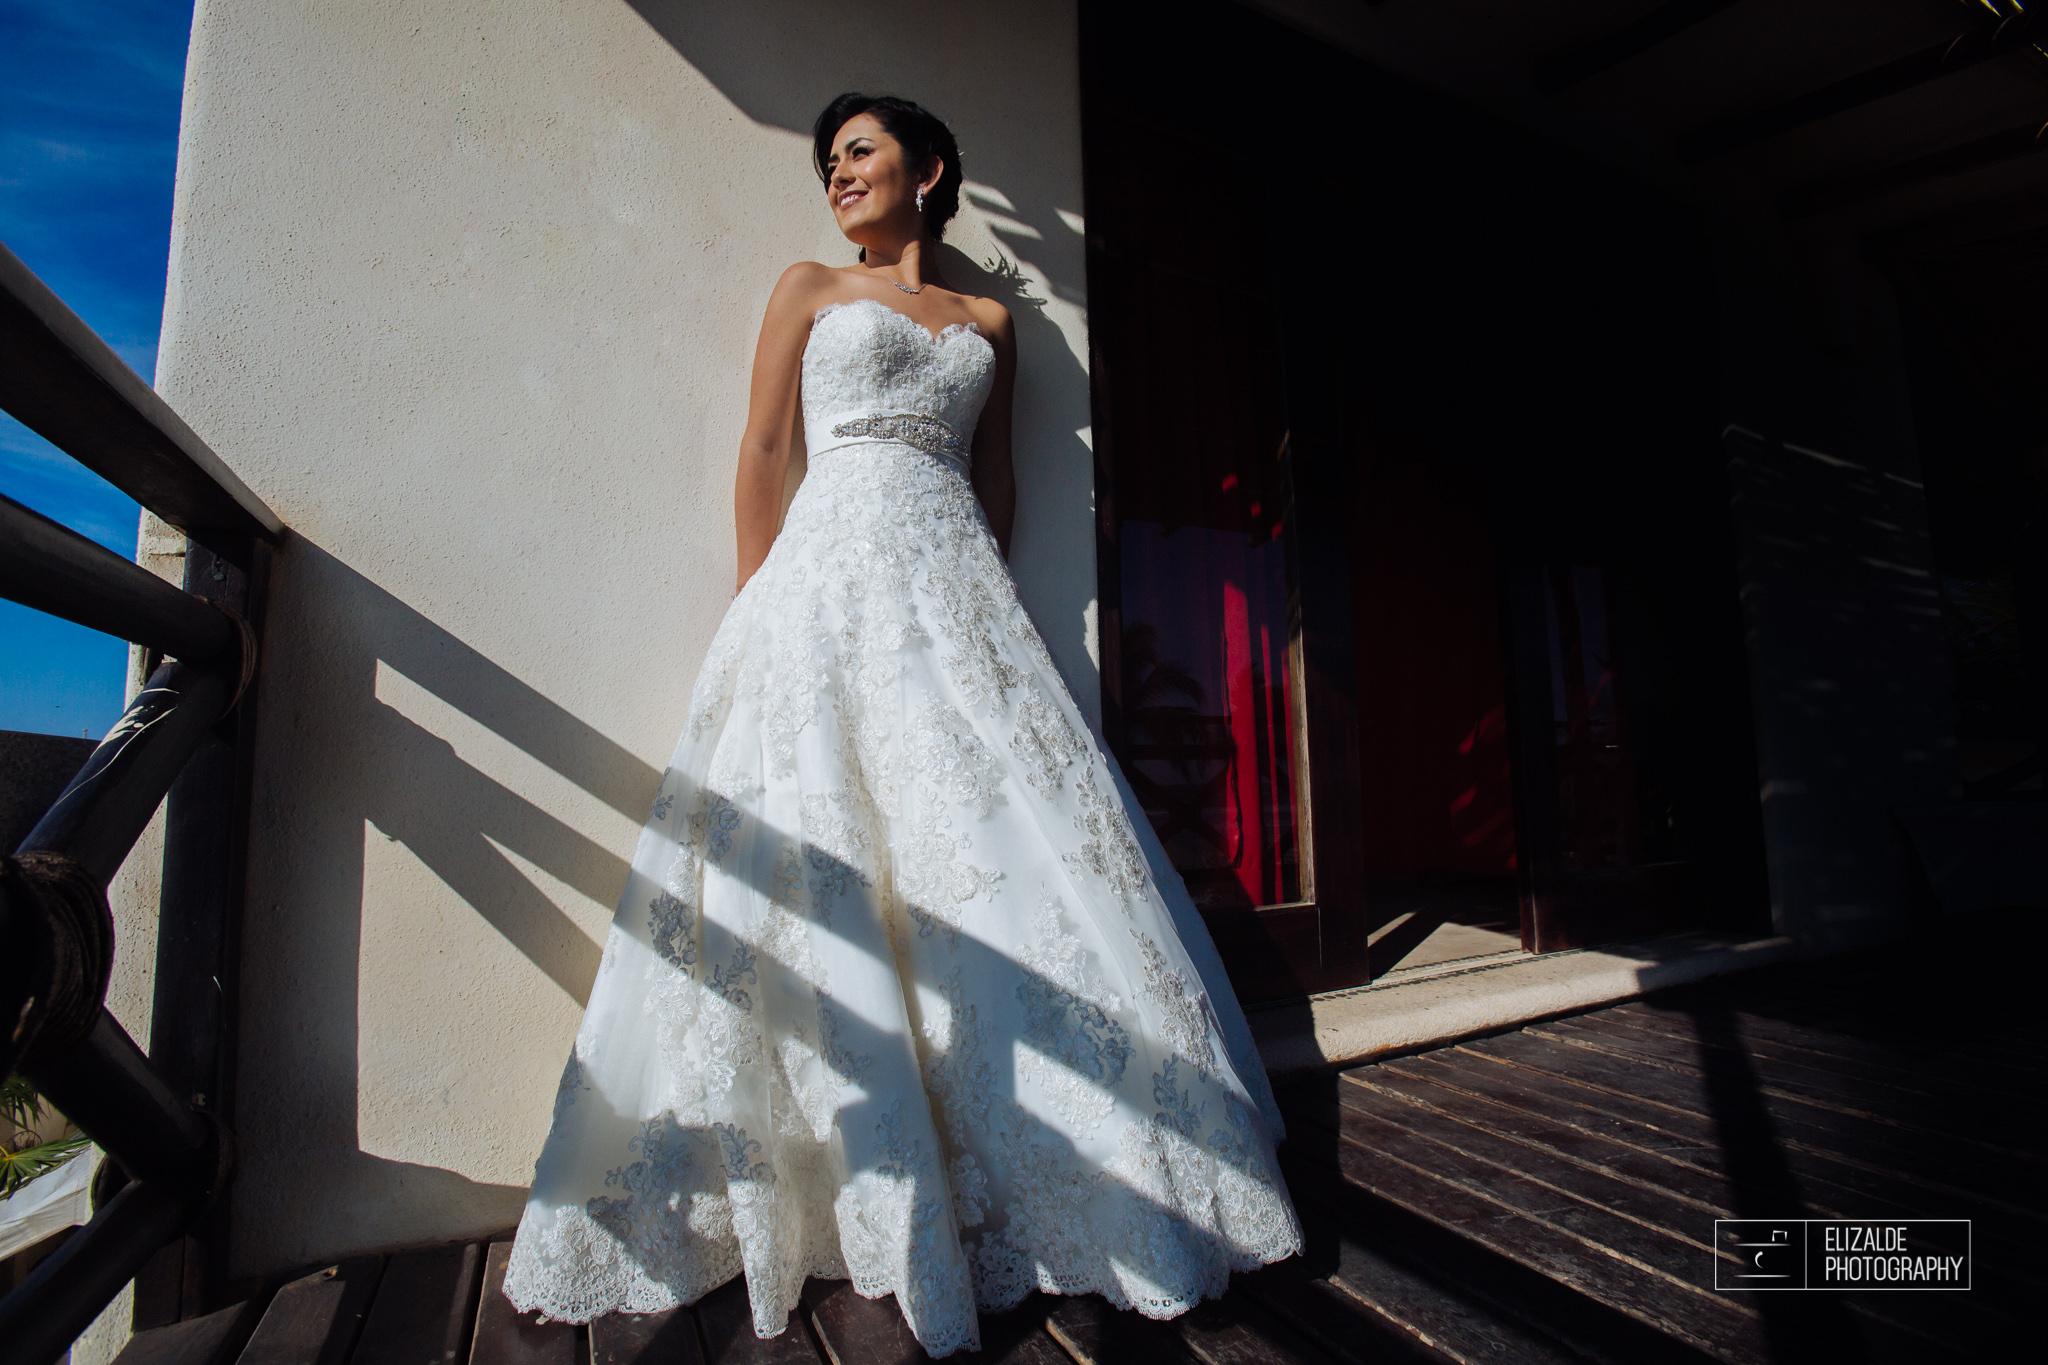 Pay and Ferran_Acapulco_Destination Wedding_Elizalde Photography-46.jpg